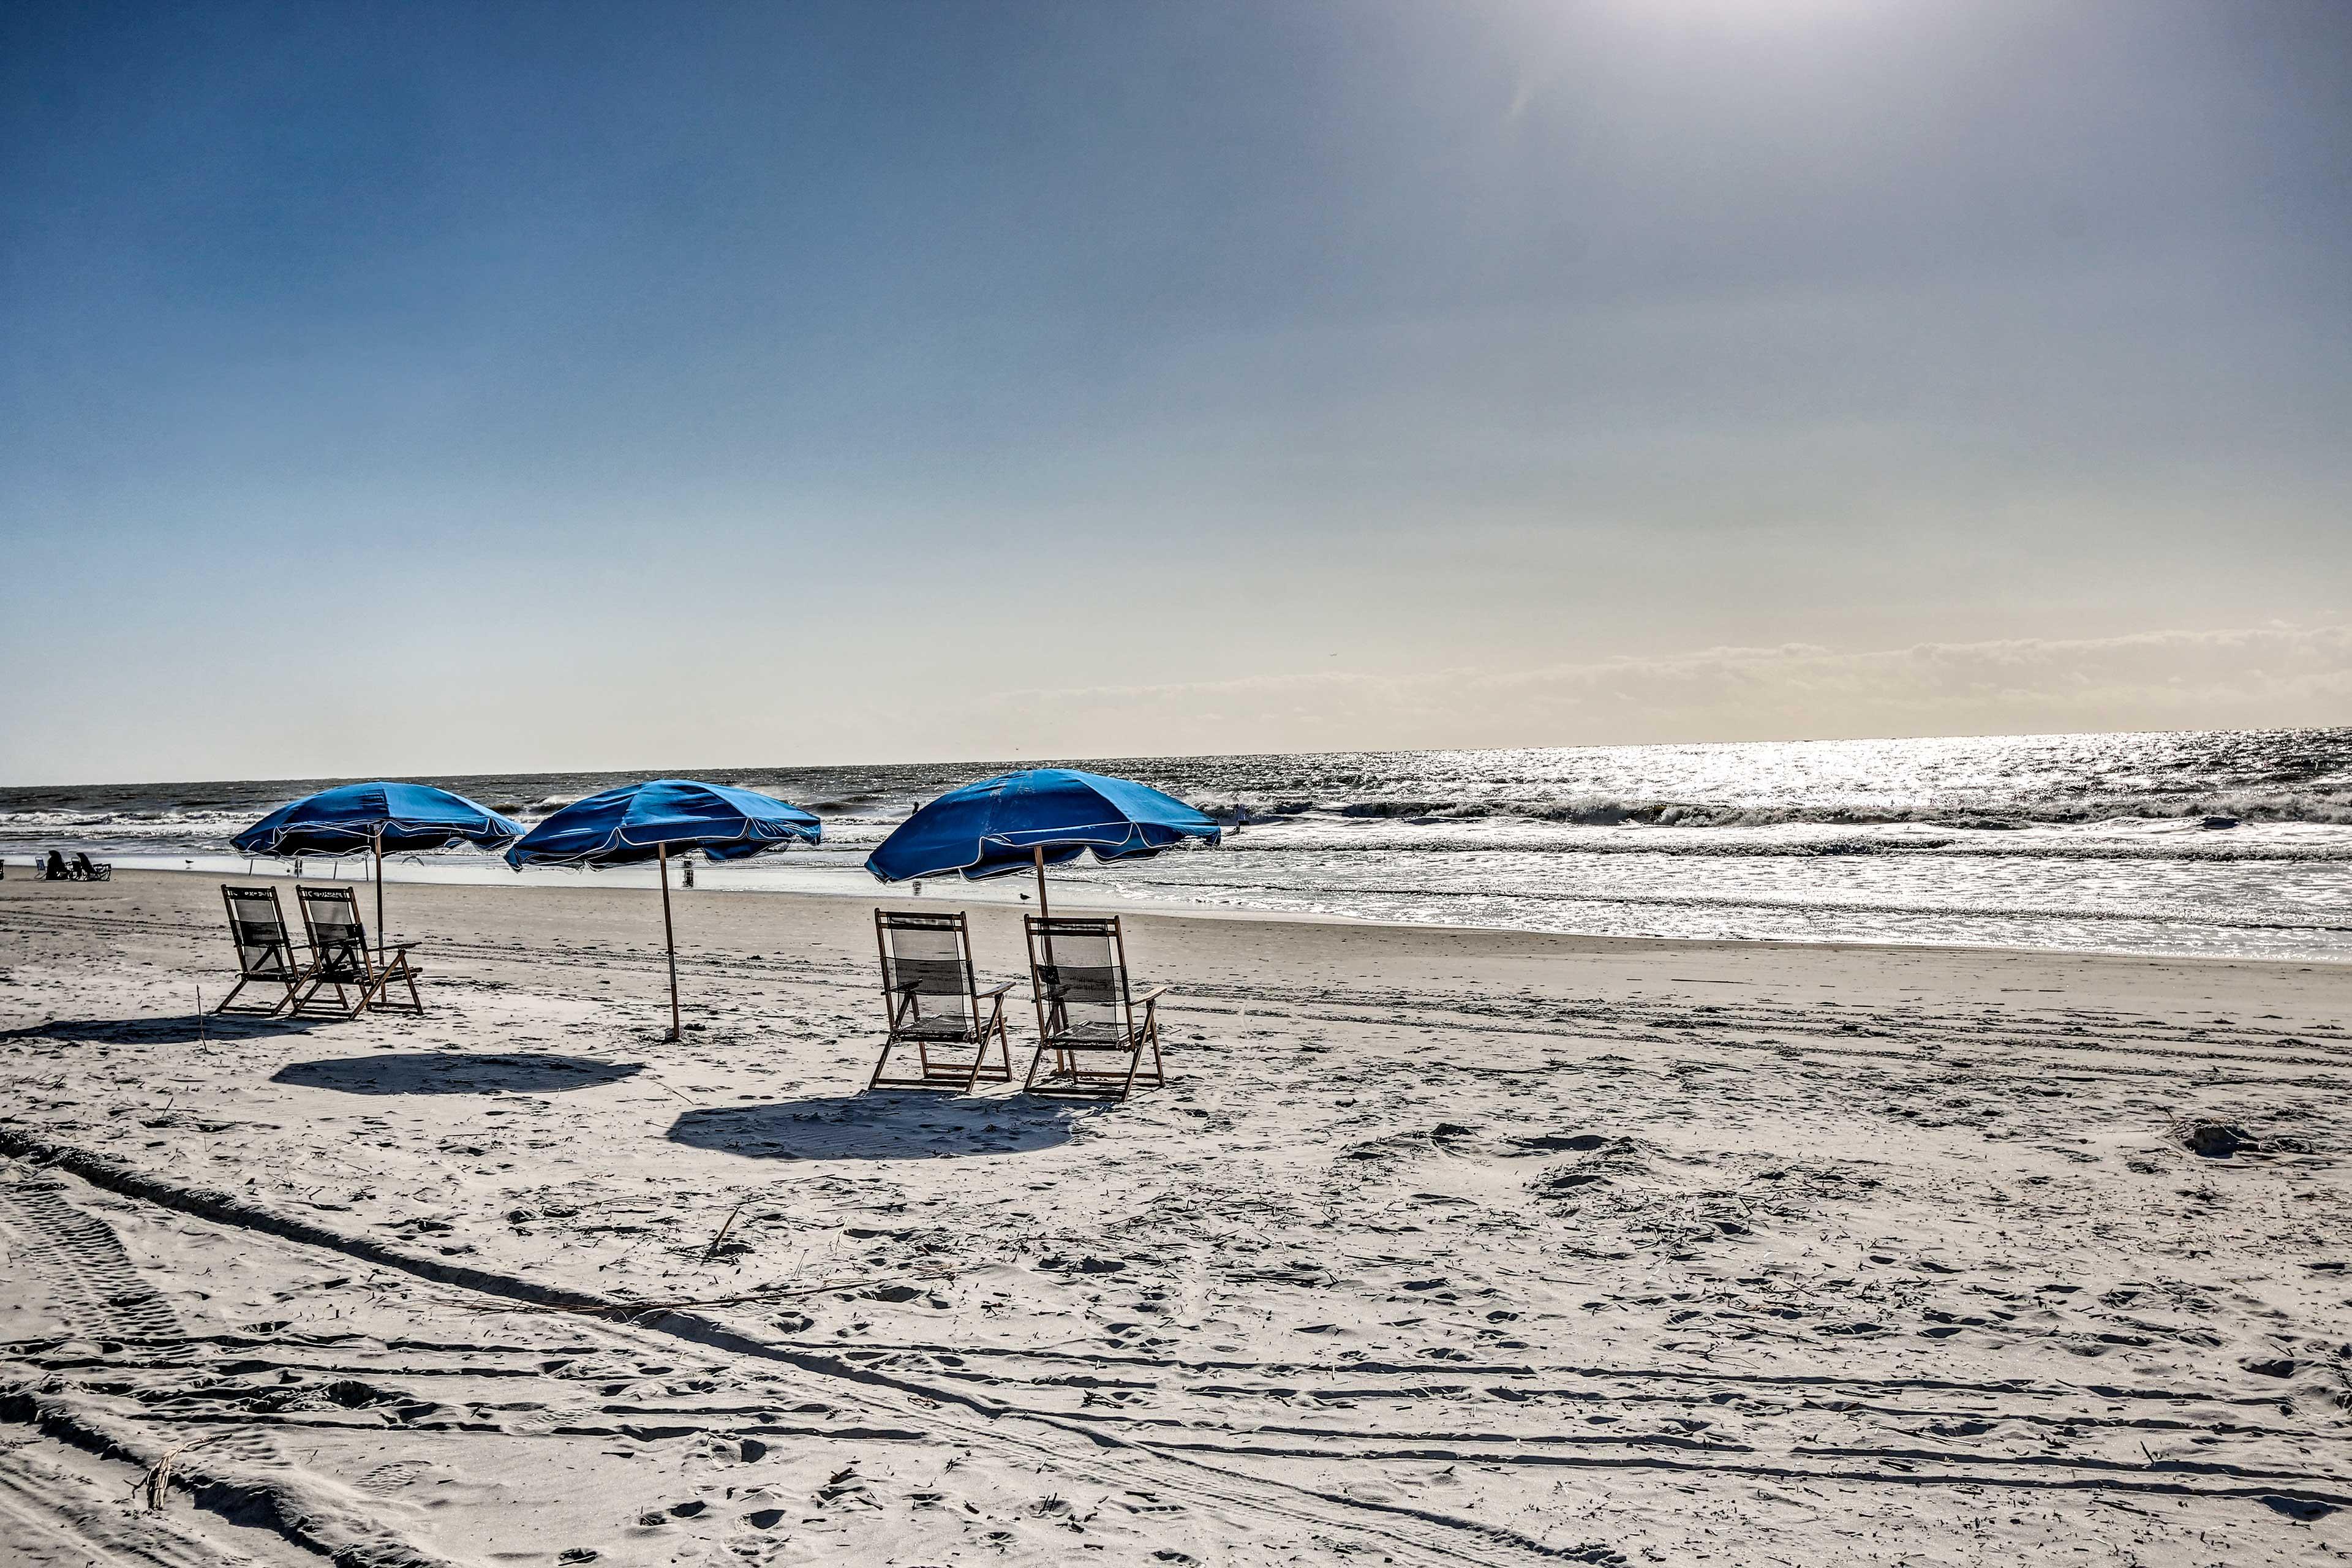 The vacation rental condo boats beach access.